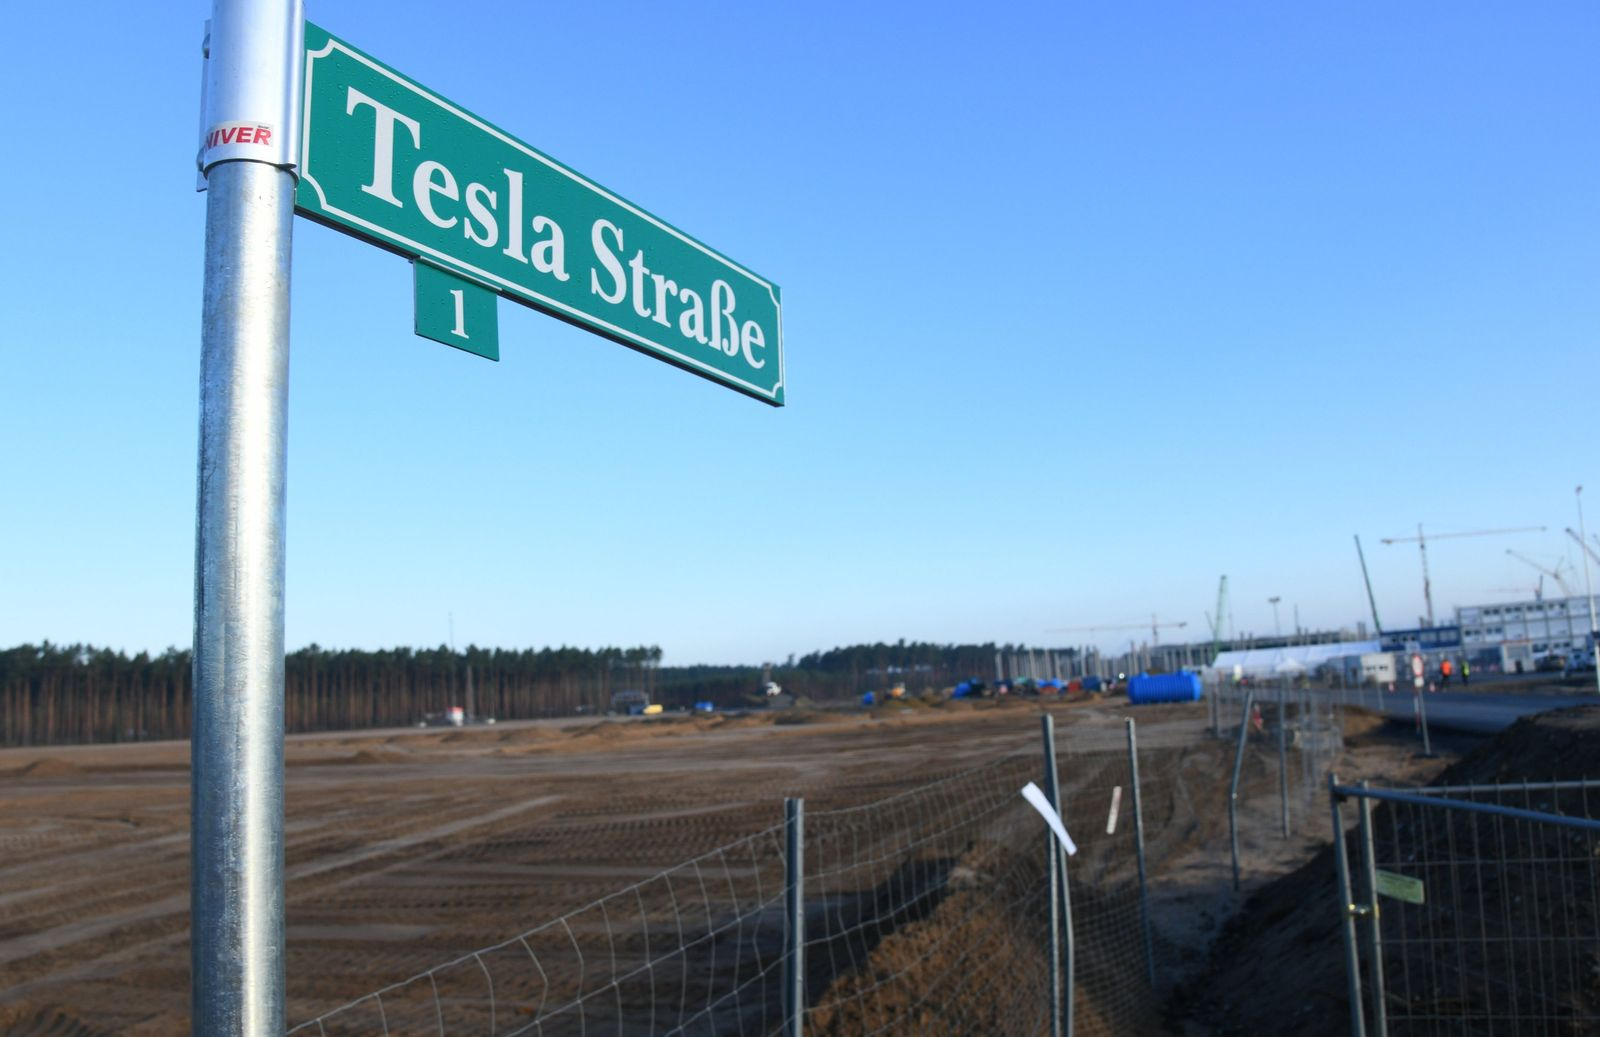 Tesla Gigafactory Berlin-Brandenburg